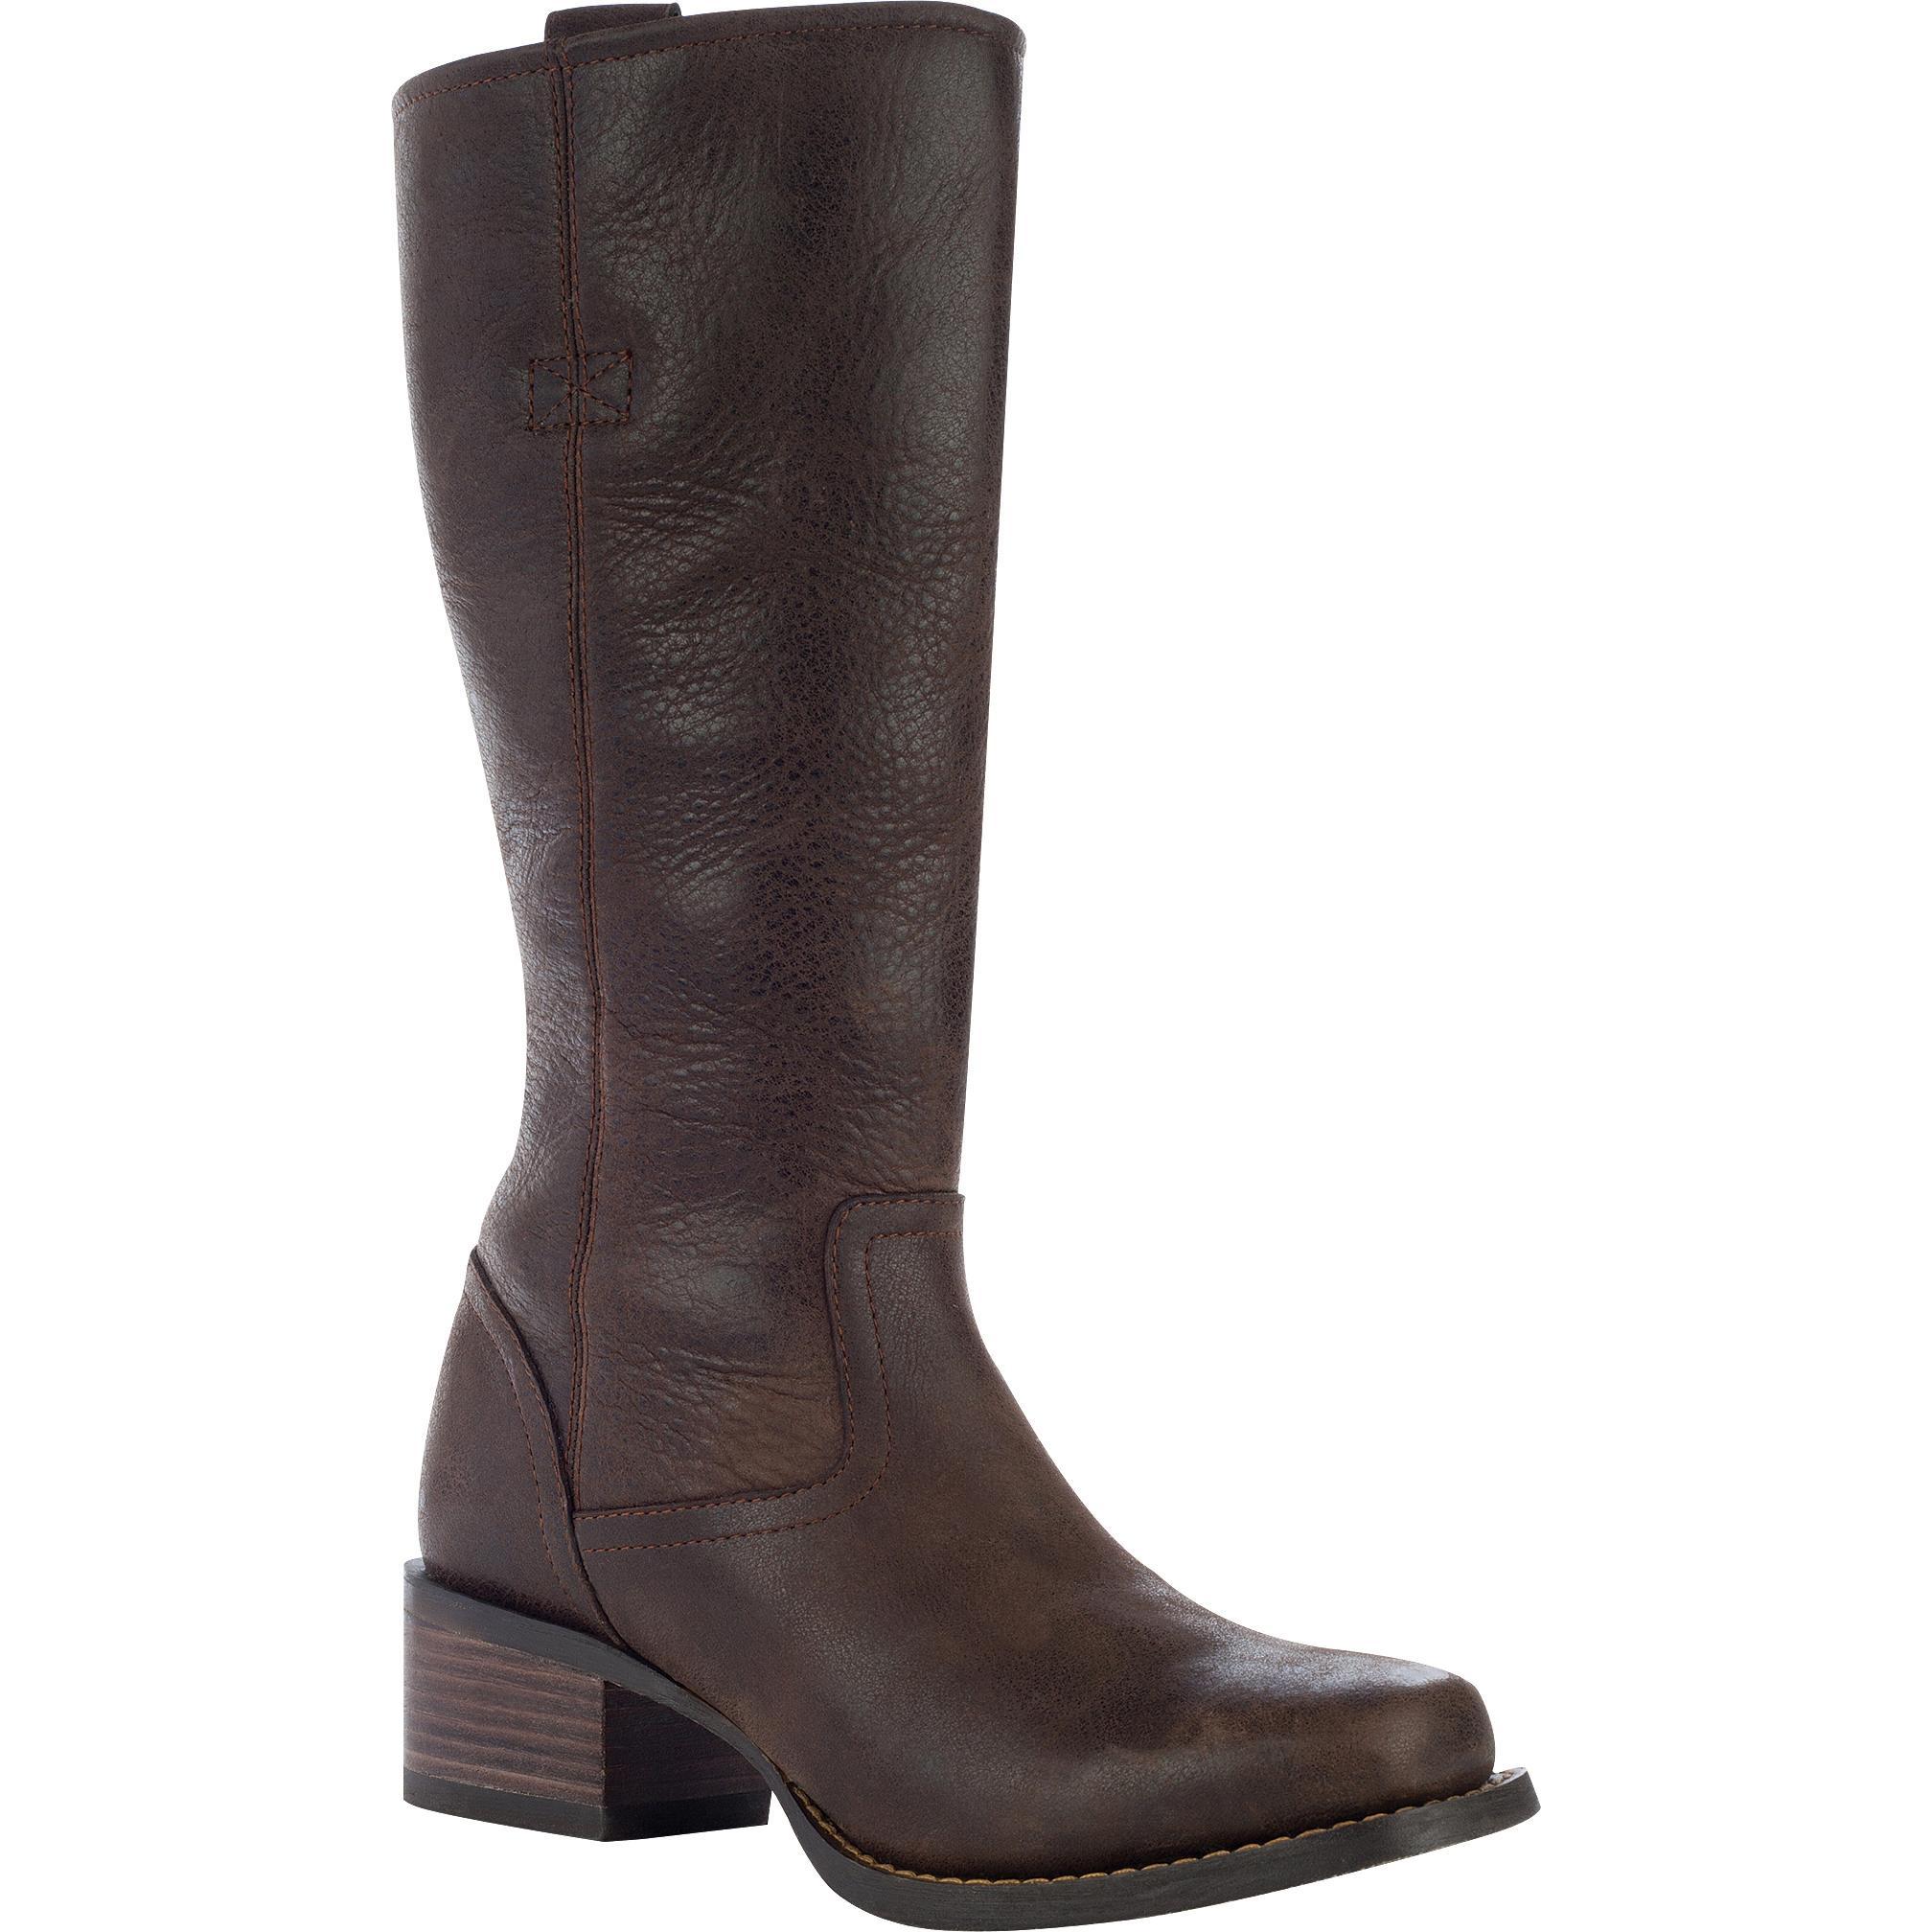 a69e0e378 Durango City: Women's Tall Brown Leather Side Zip Boots